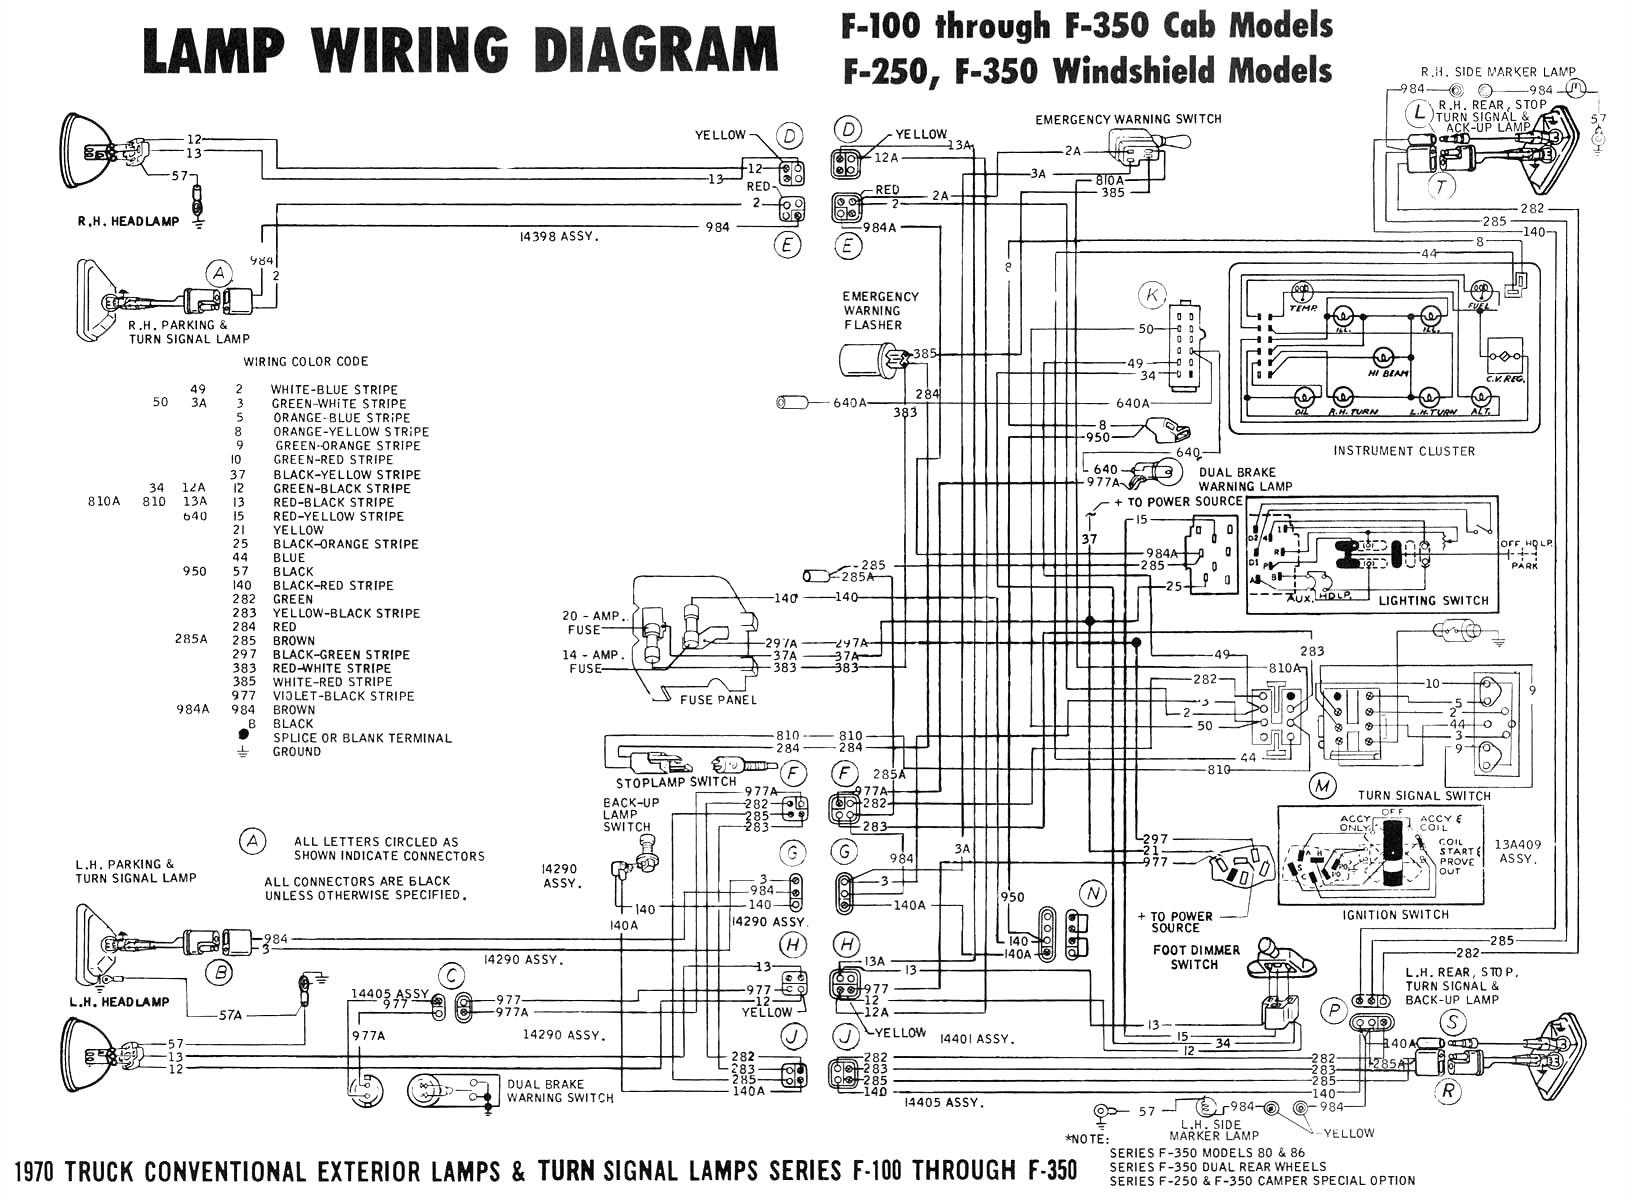 1996 ford Bronco Wiring Diagram Control Module Diagram for 1996 ford F 350 Wiring Diagram Operations